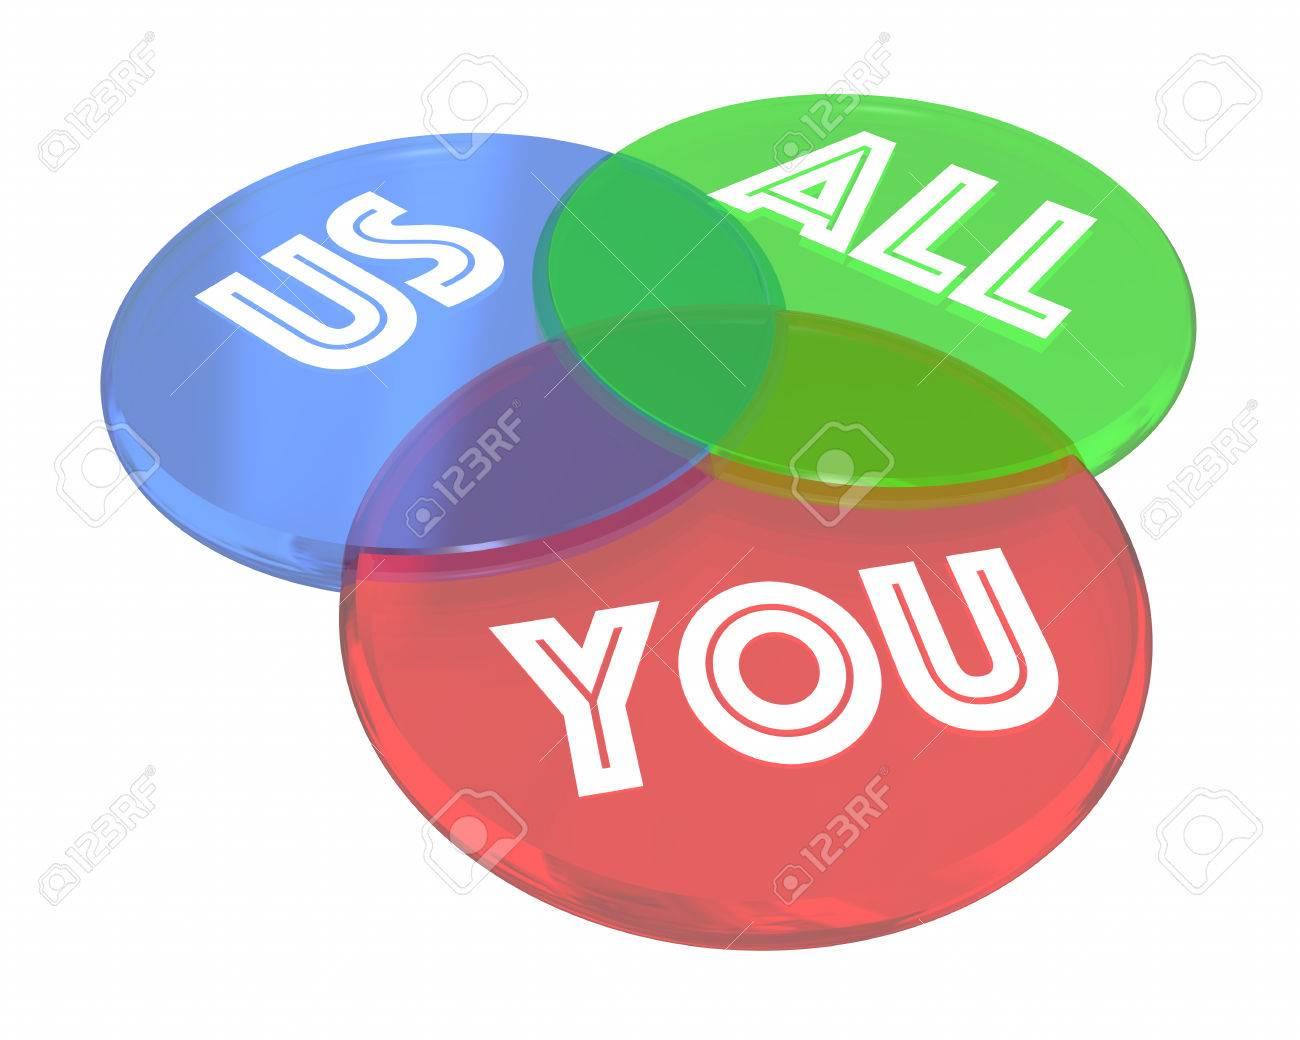 Nos Todos Los Beneficios Compartidos De Interés Común Diagrama De ...